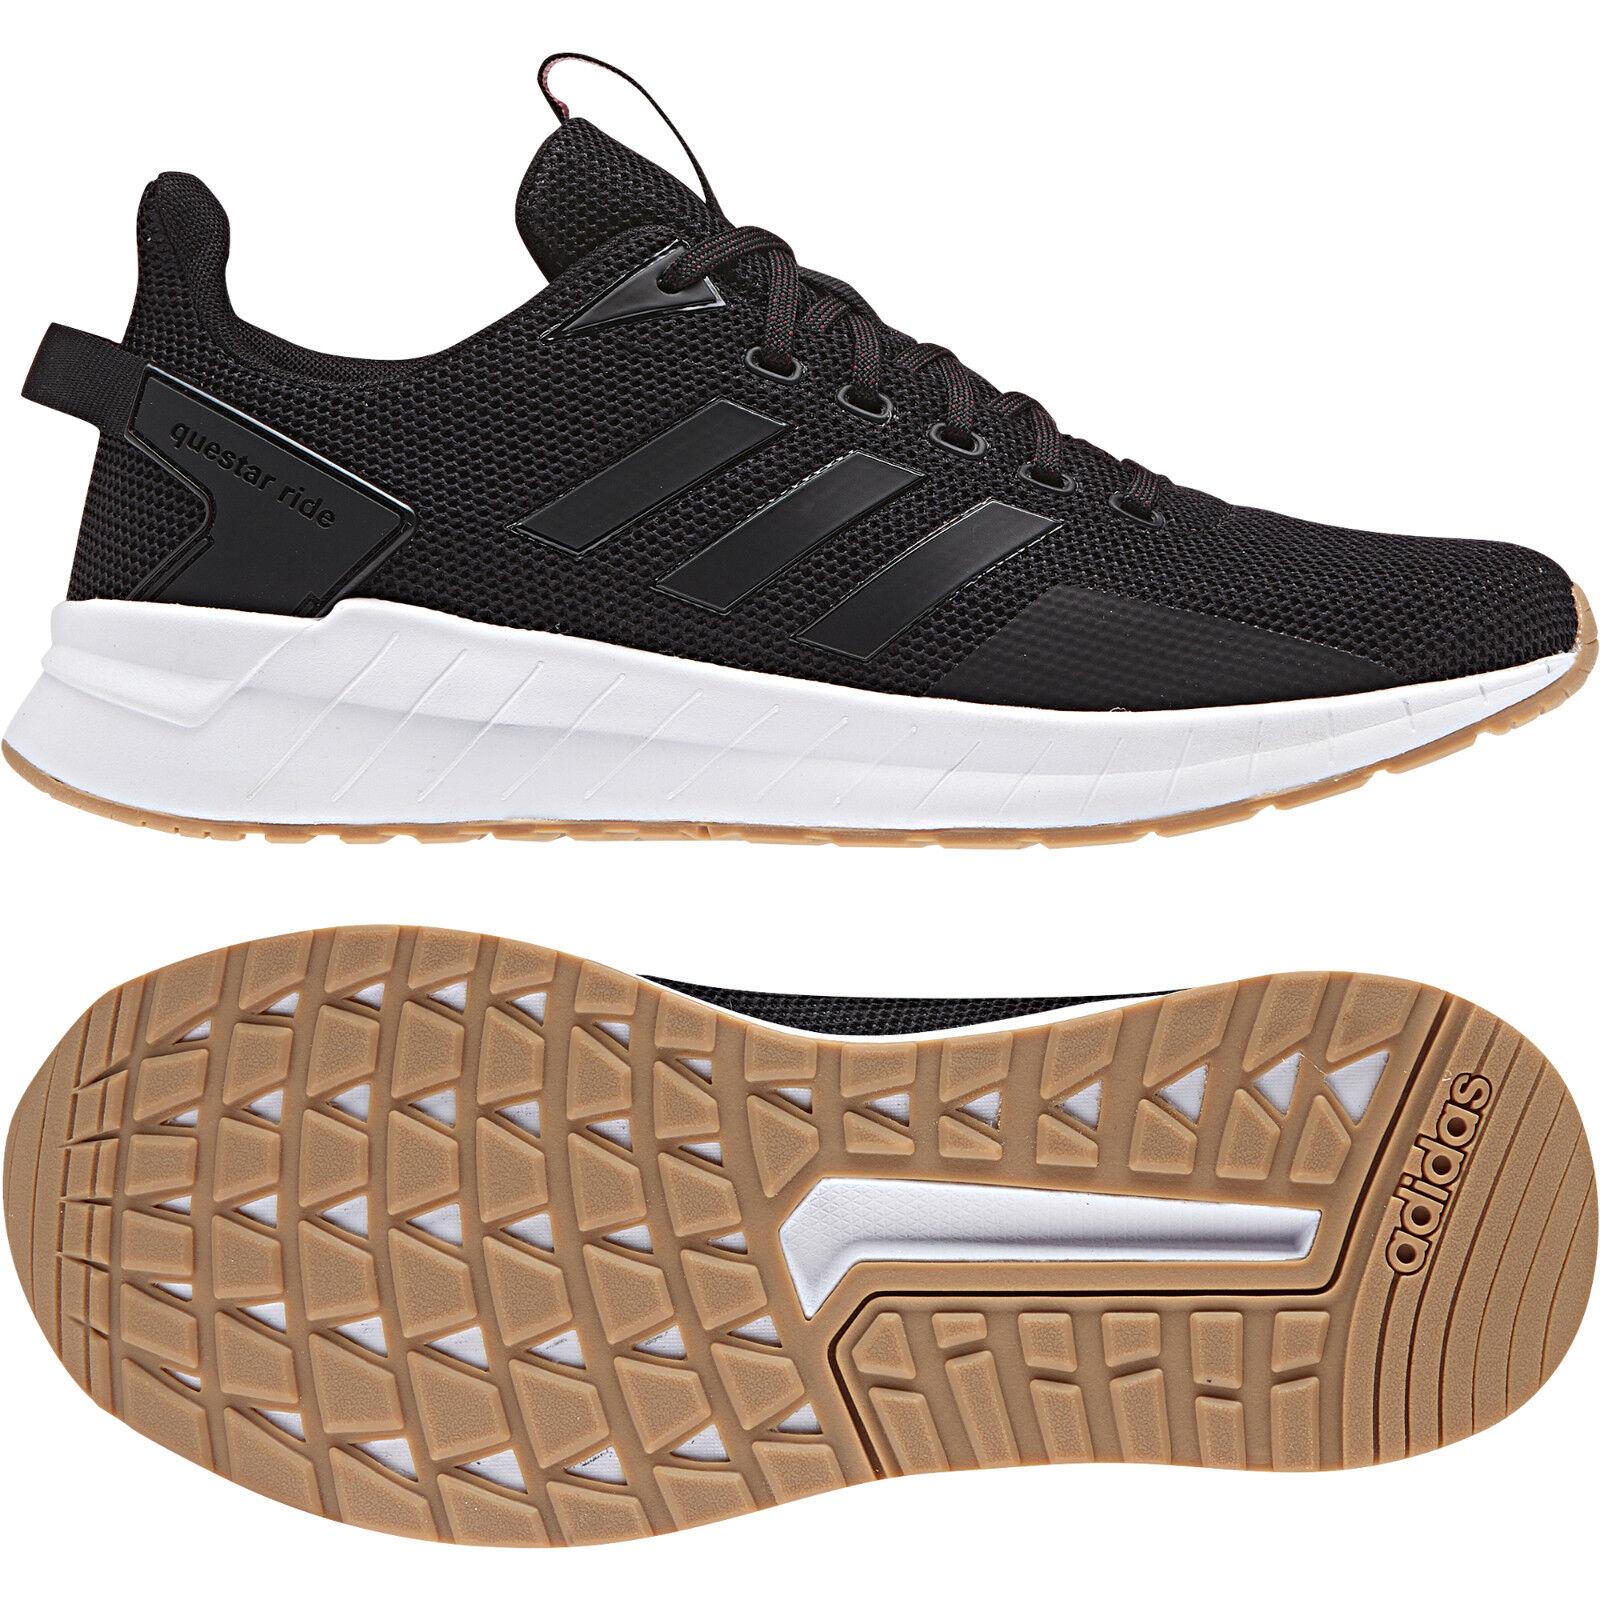 Adidas femmes Running Chaussures Questar Ride Cloudfoam Training noir Trainers B44832